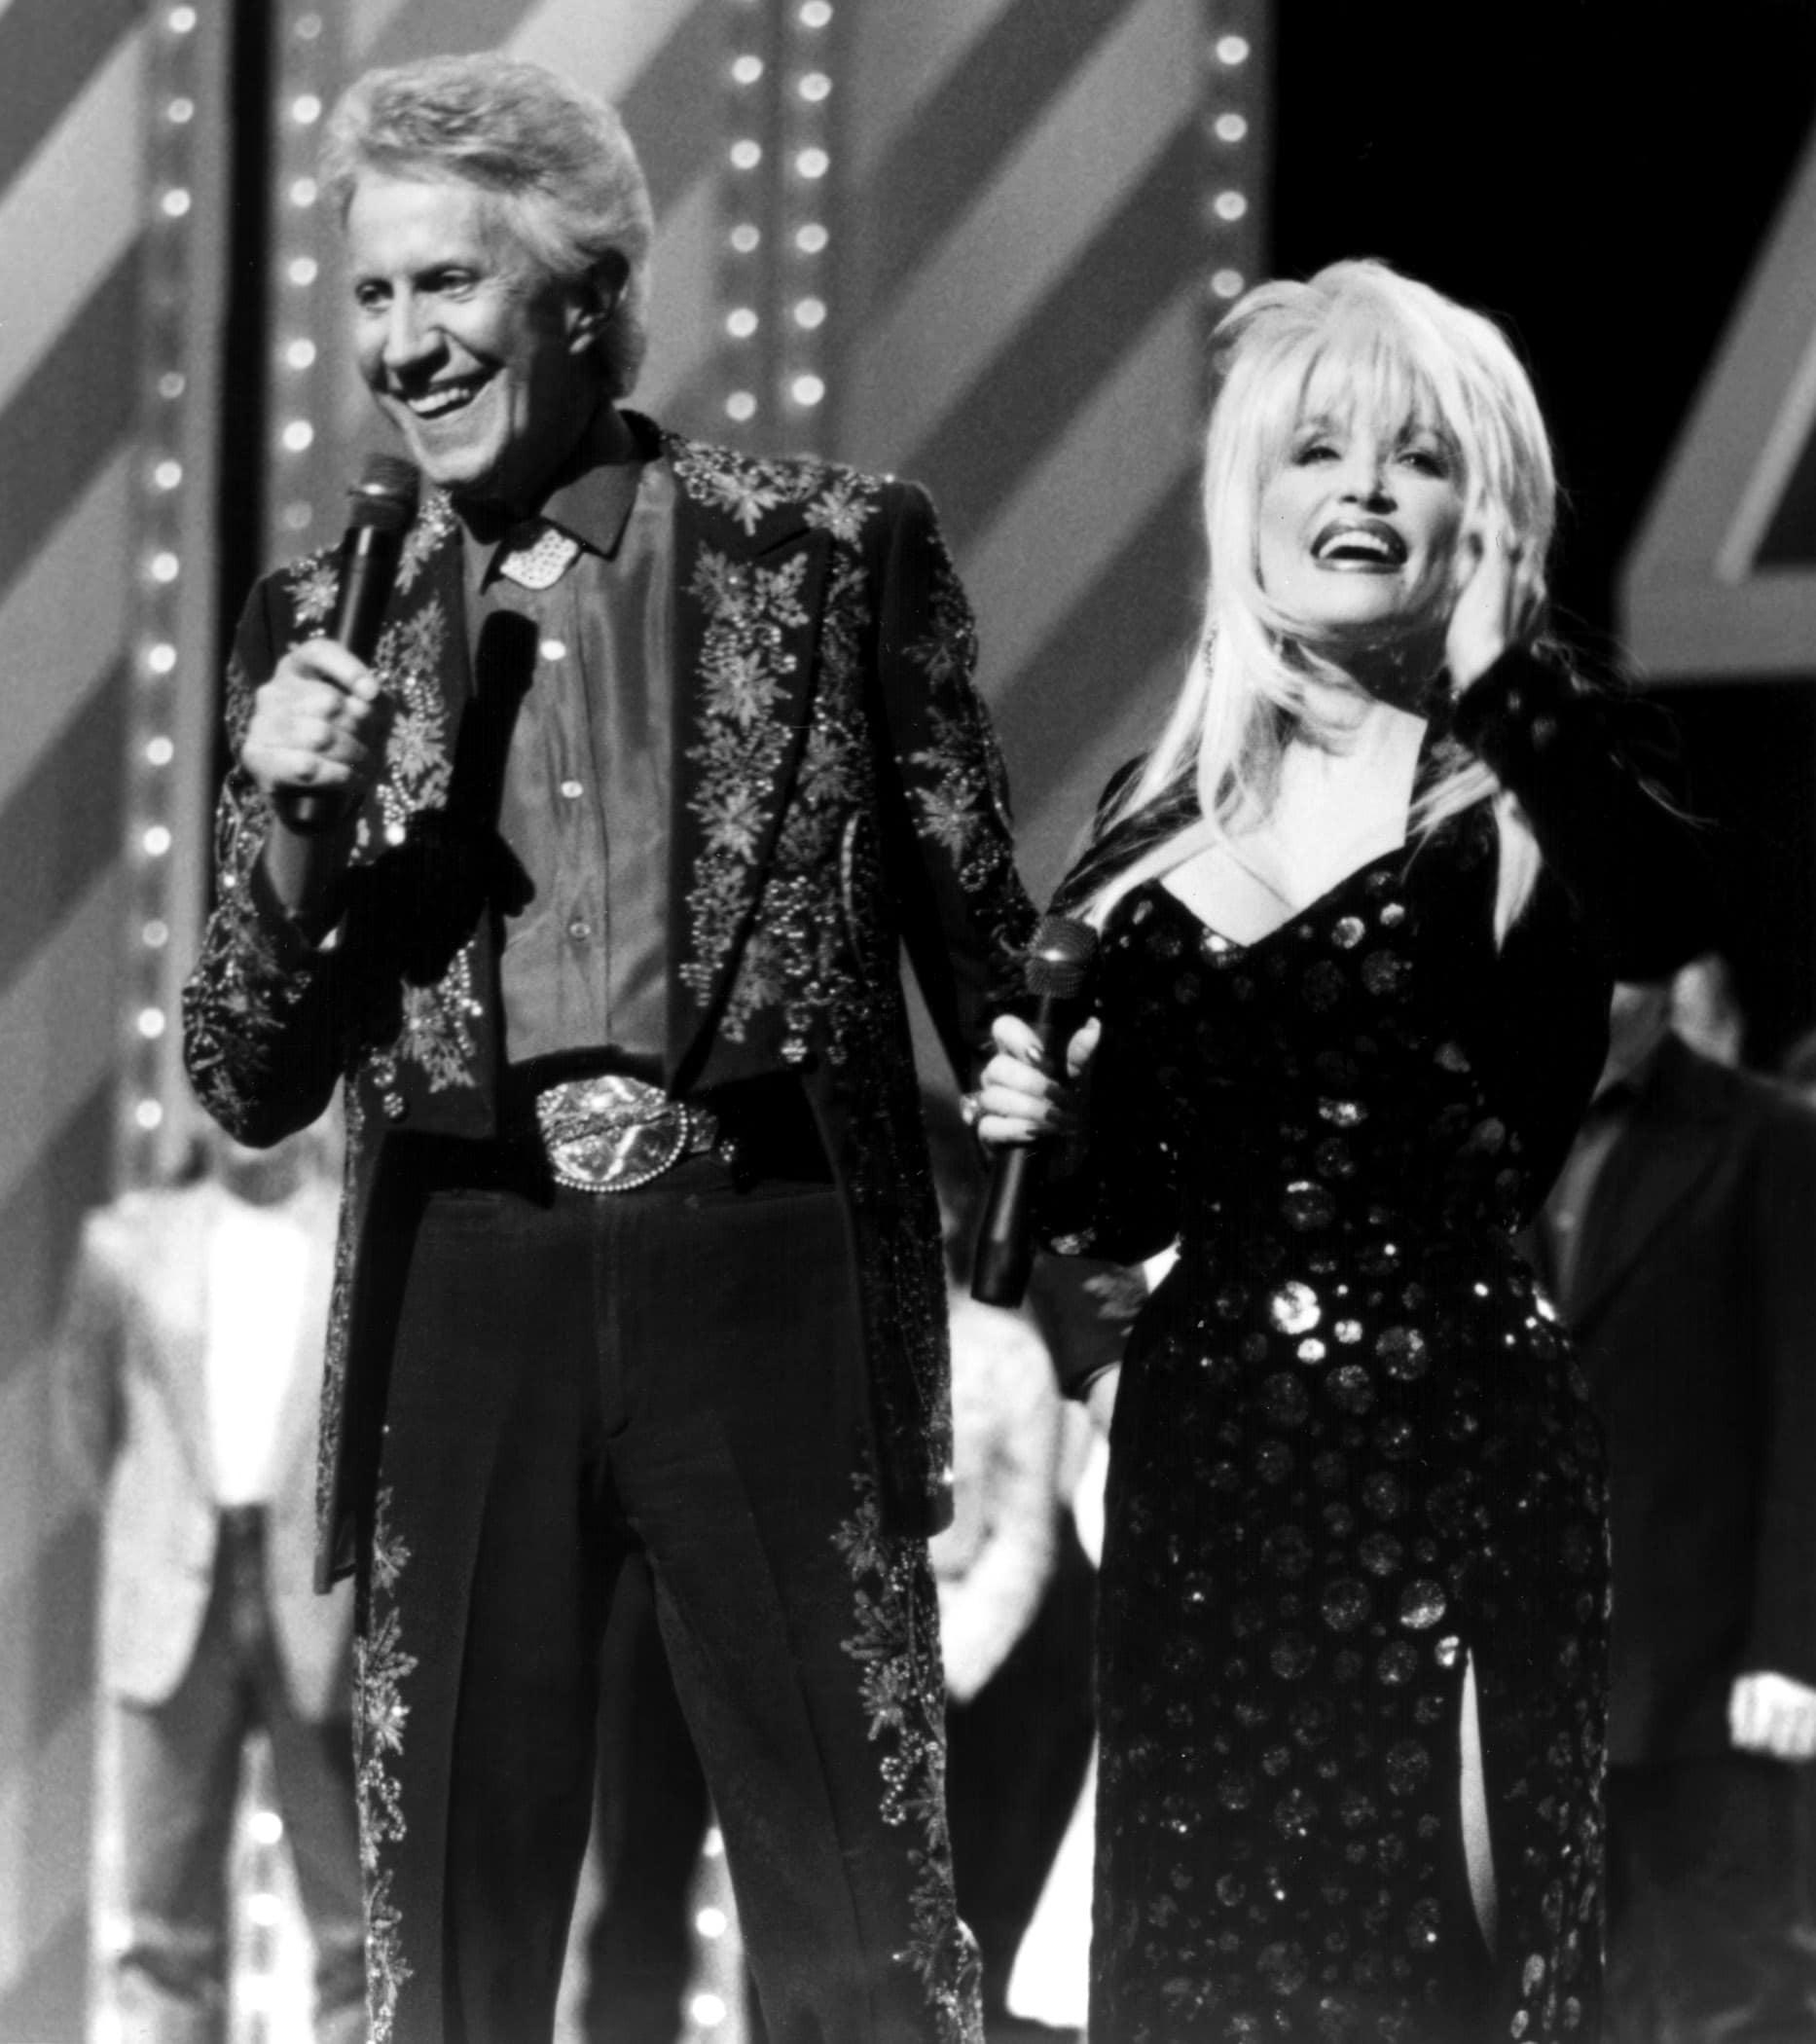 Porter Wagoner, Dolly Parton on A TRIBUTE TO PORTER WAGONER on the Nashville Network